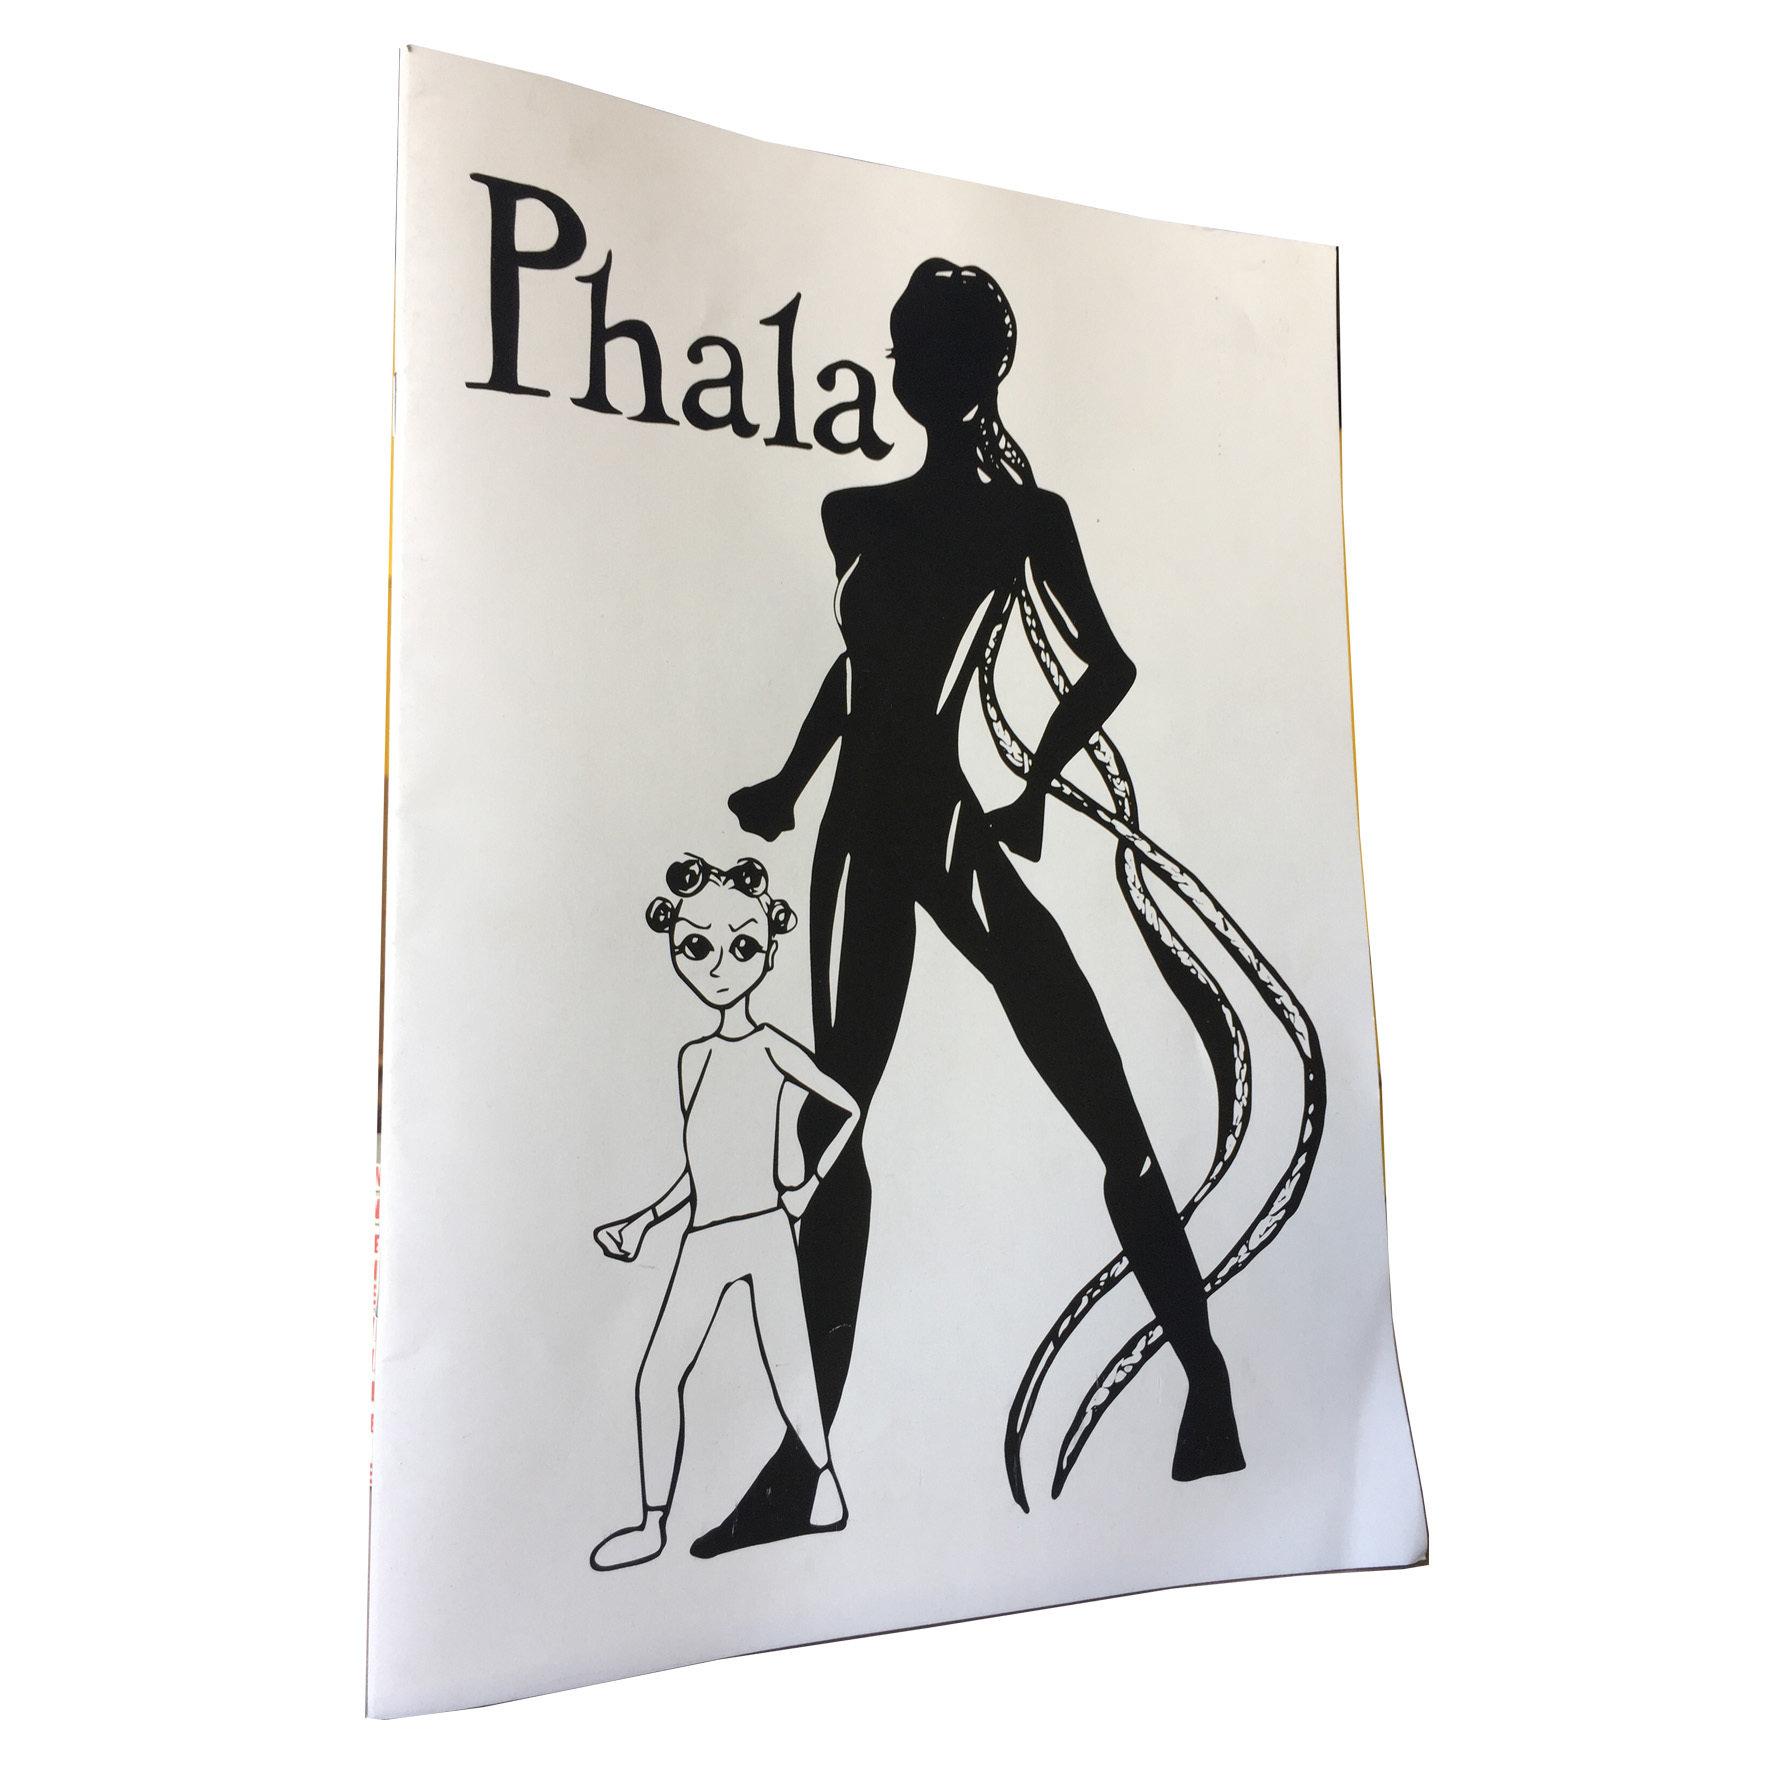 Phala by Phemelo Hellmann and Nompumelelo Kubheka Art by Bianca Levin (Hellmann) PH01